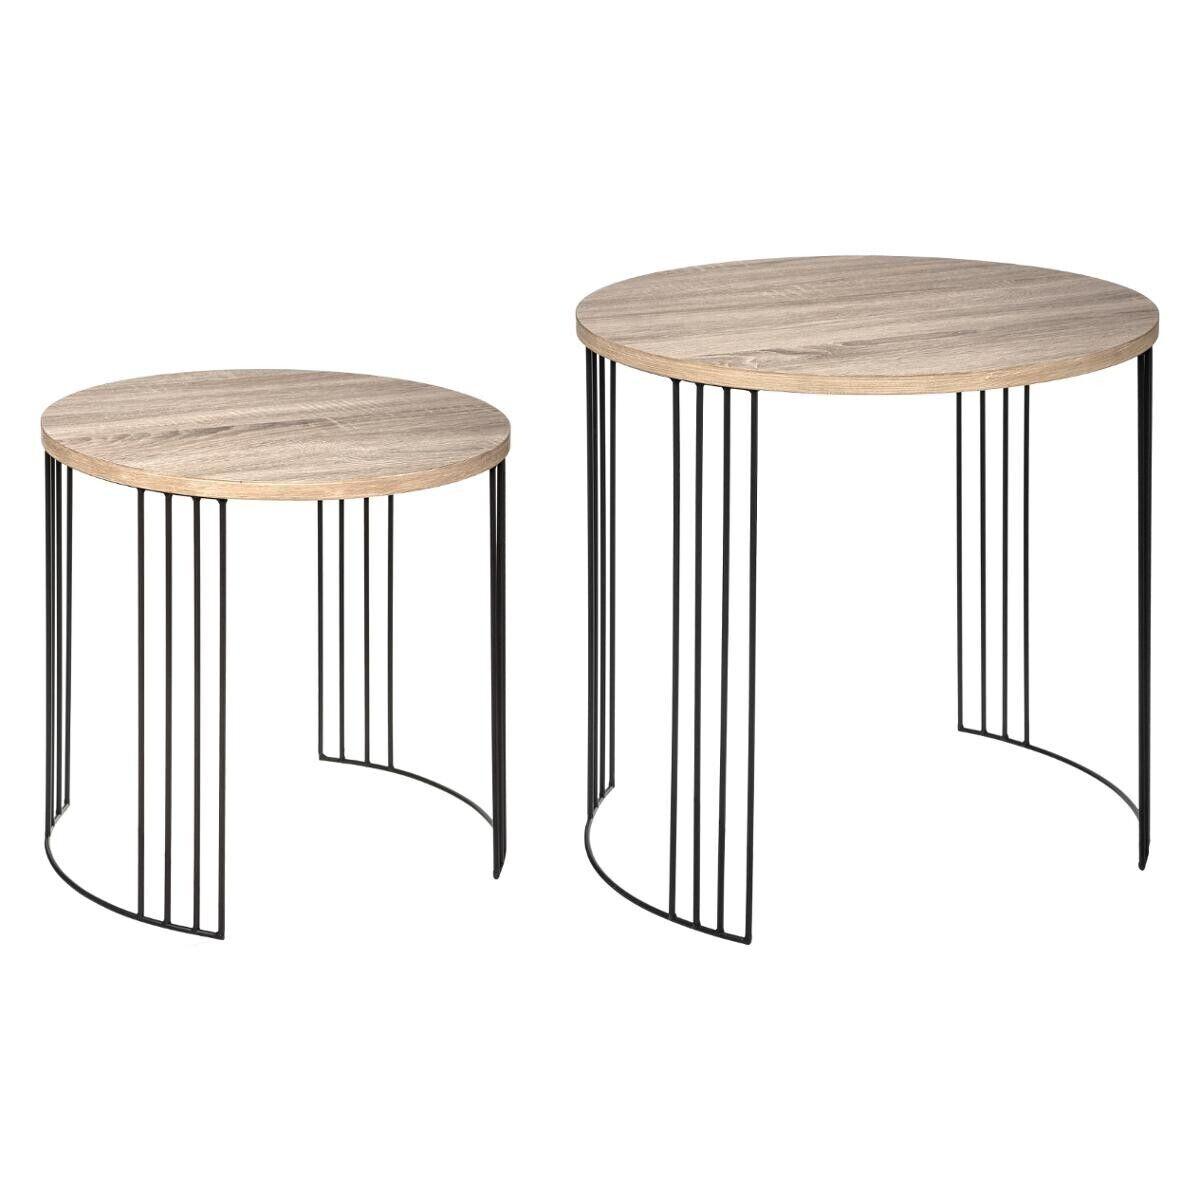 "Atmosphera Lot de 2 tables d'appoint gigognes ""Neile"" en bois fer"